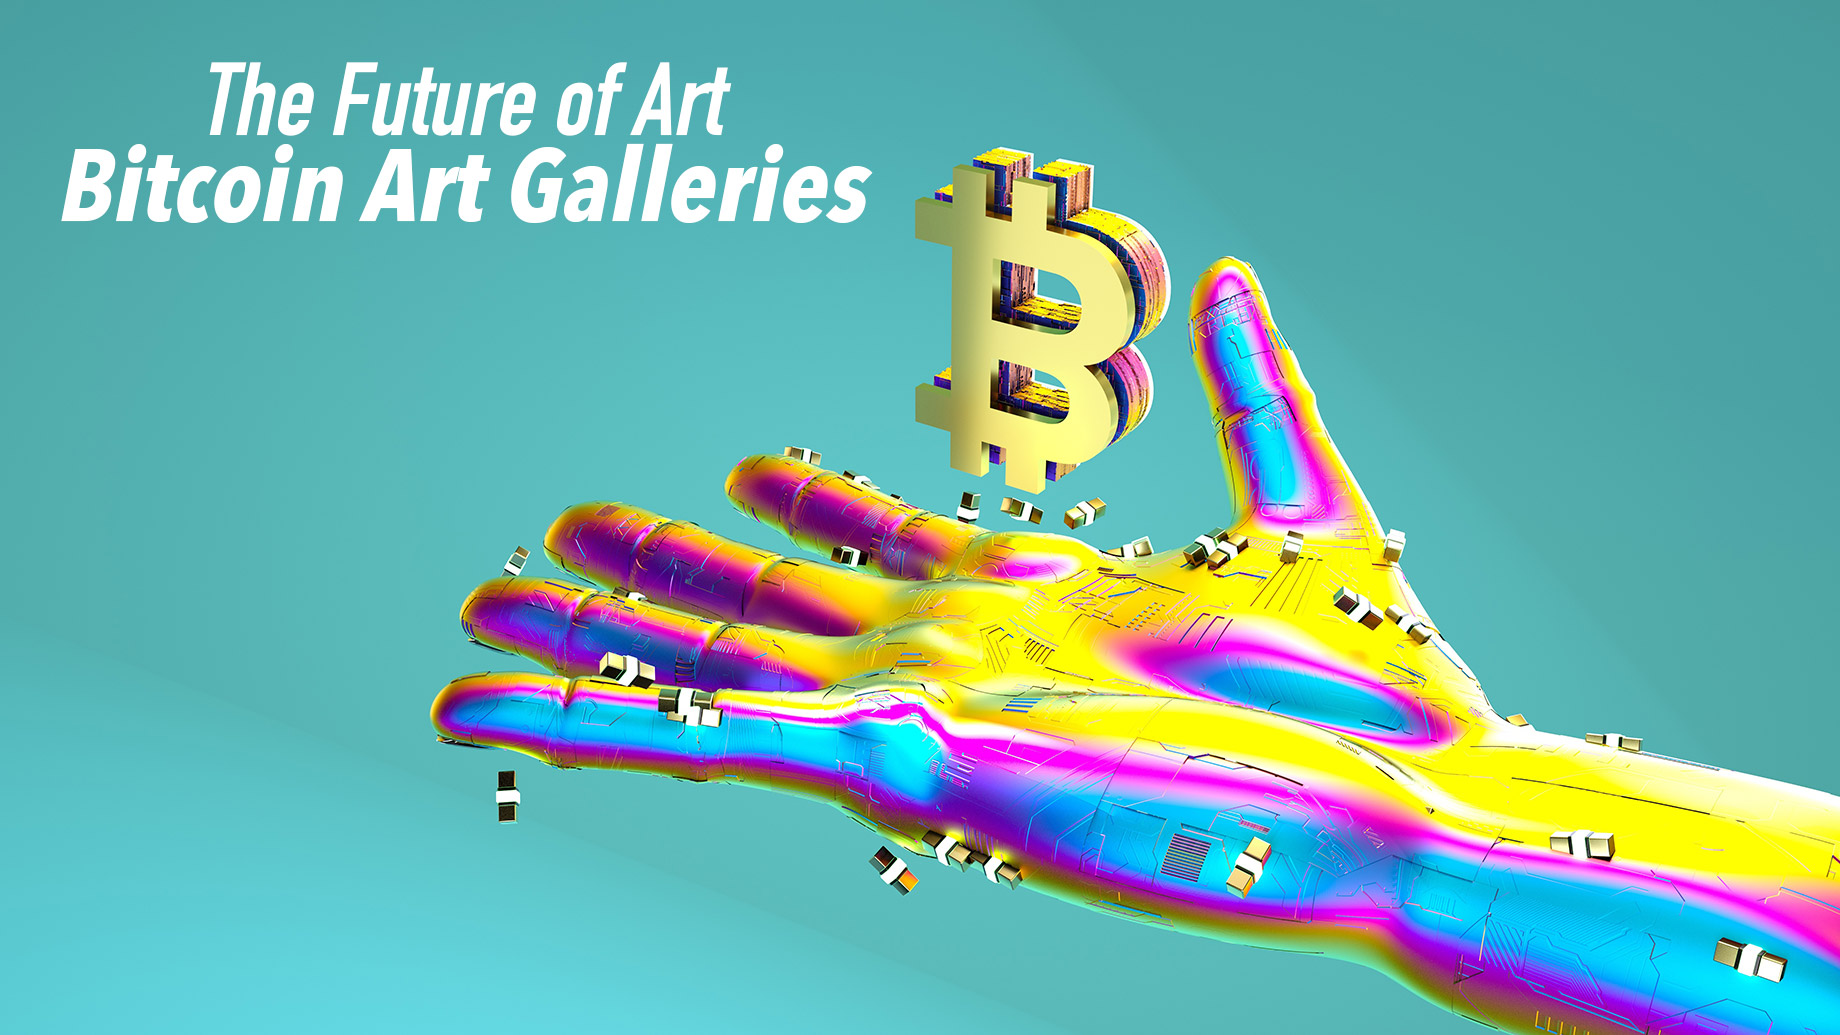 The Future of Art - Bitcoin Art Galleries